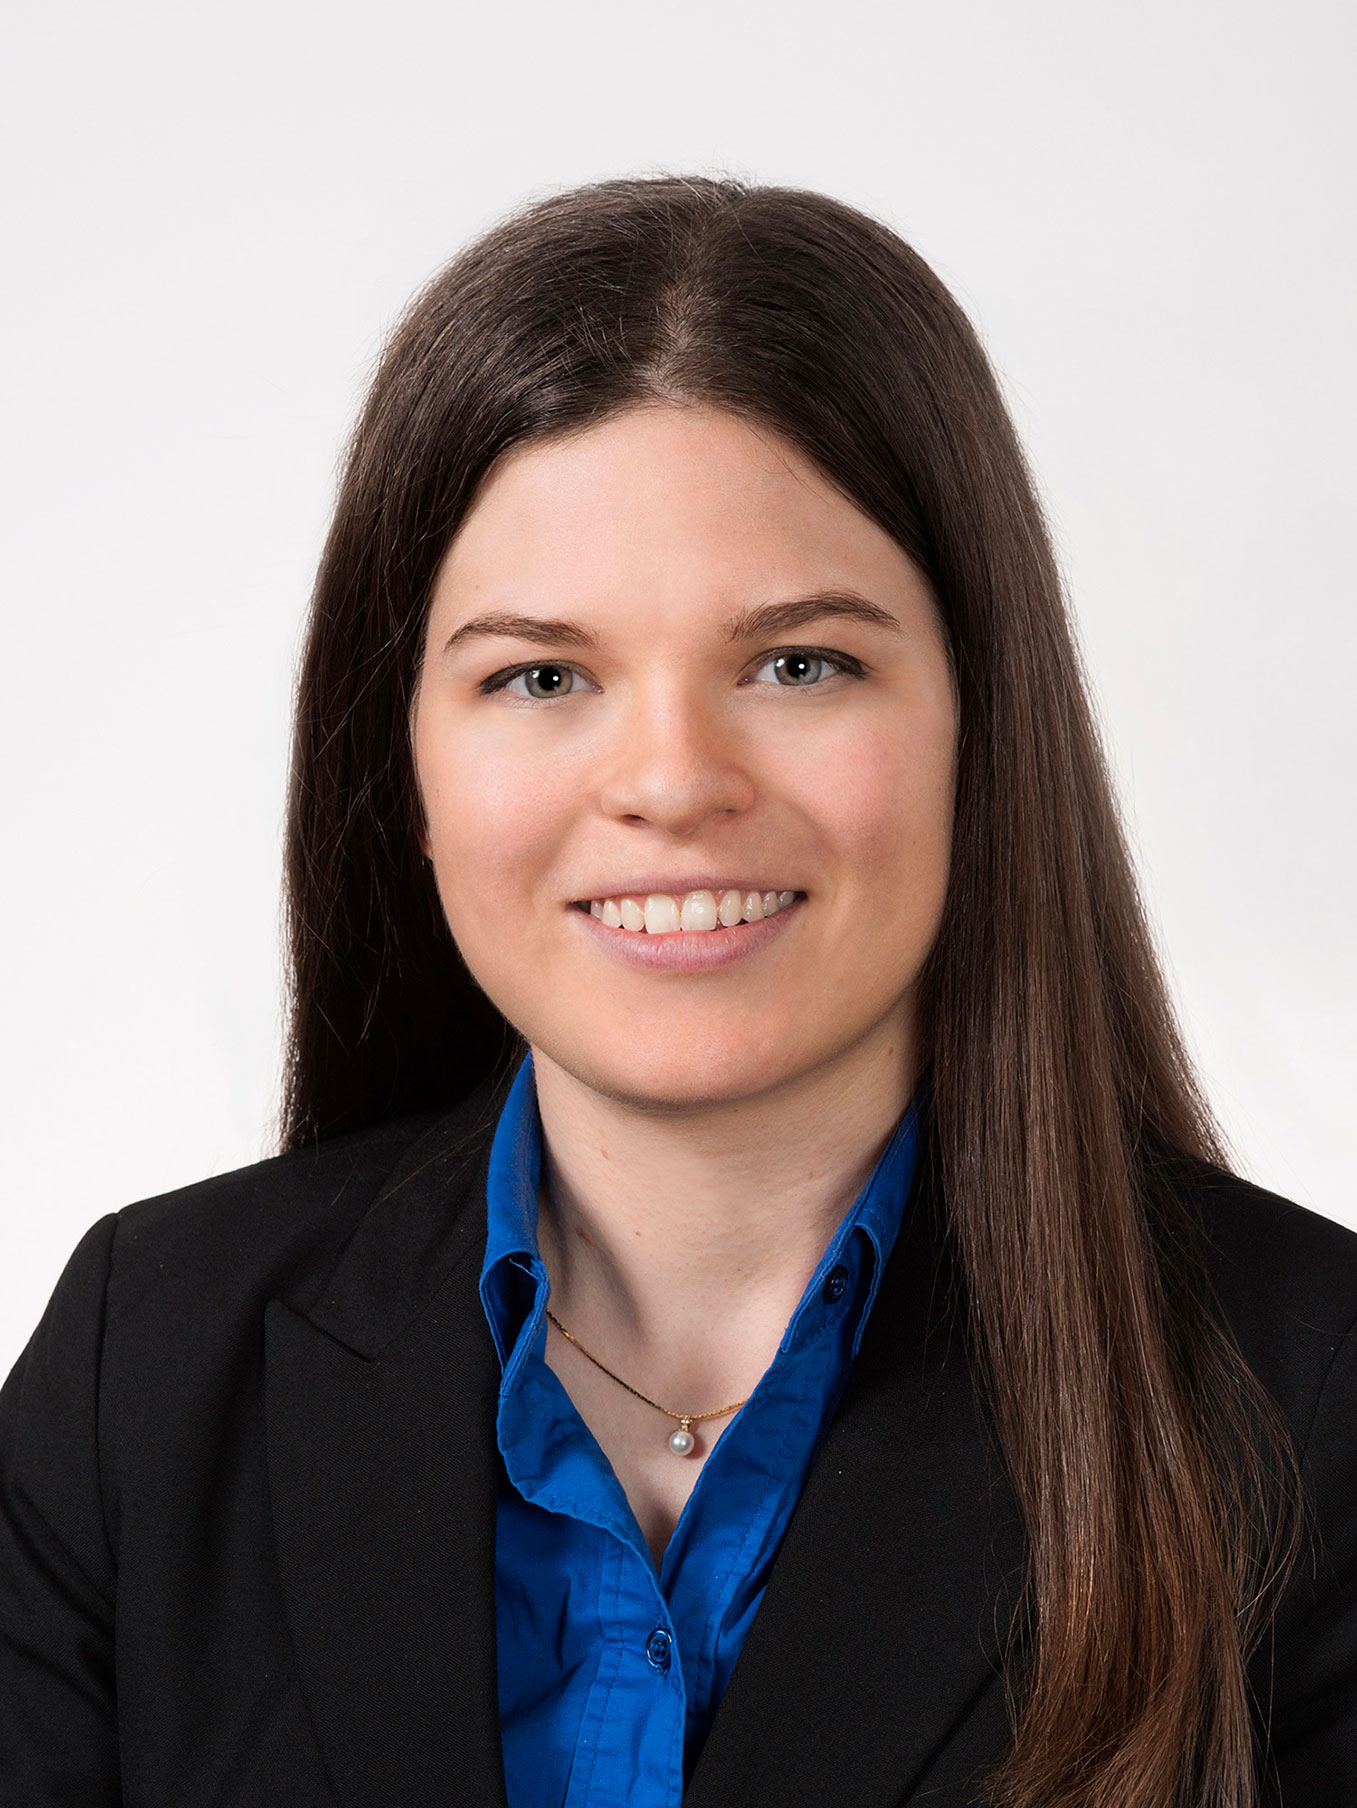 Natalie Brown, Administrative Assistant of Day Hagan Asset Management in Sarasota, FL.